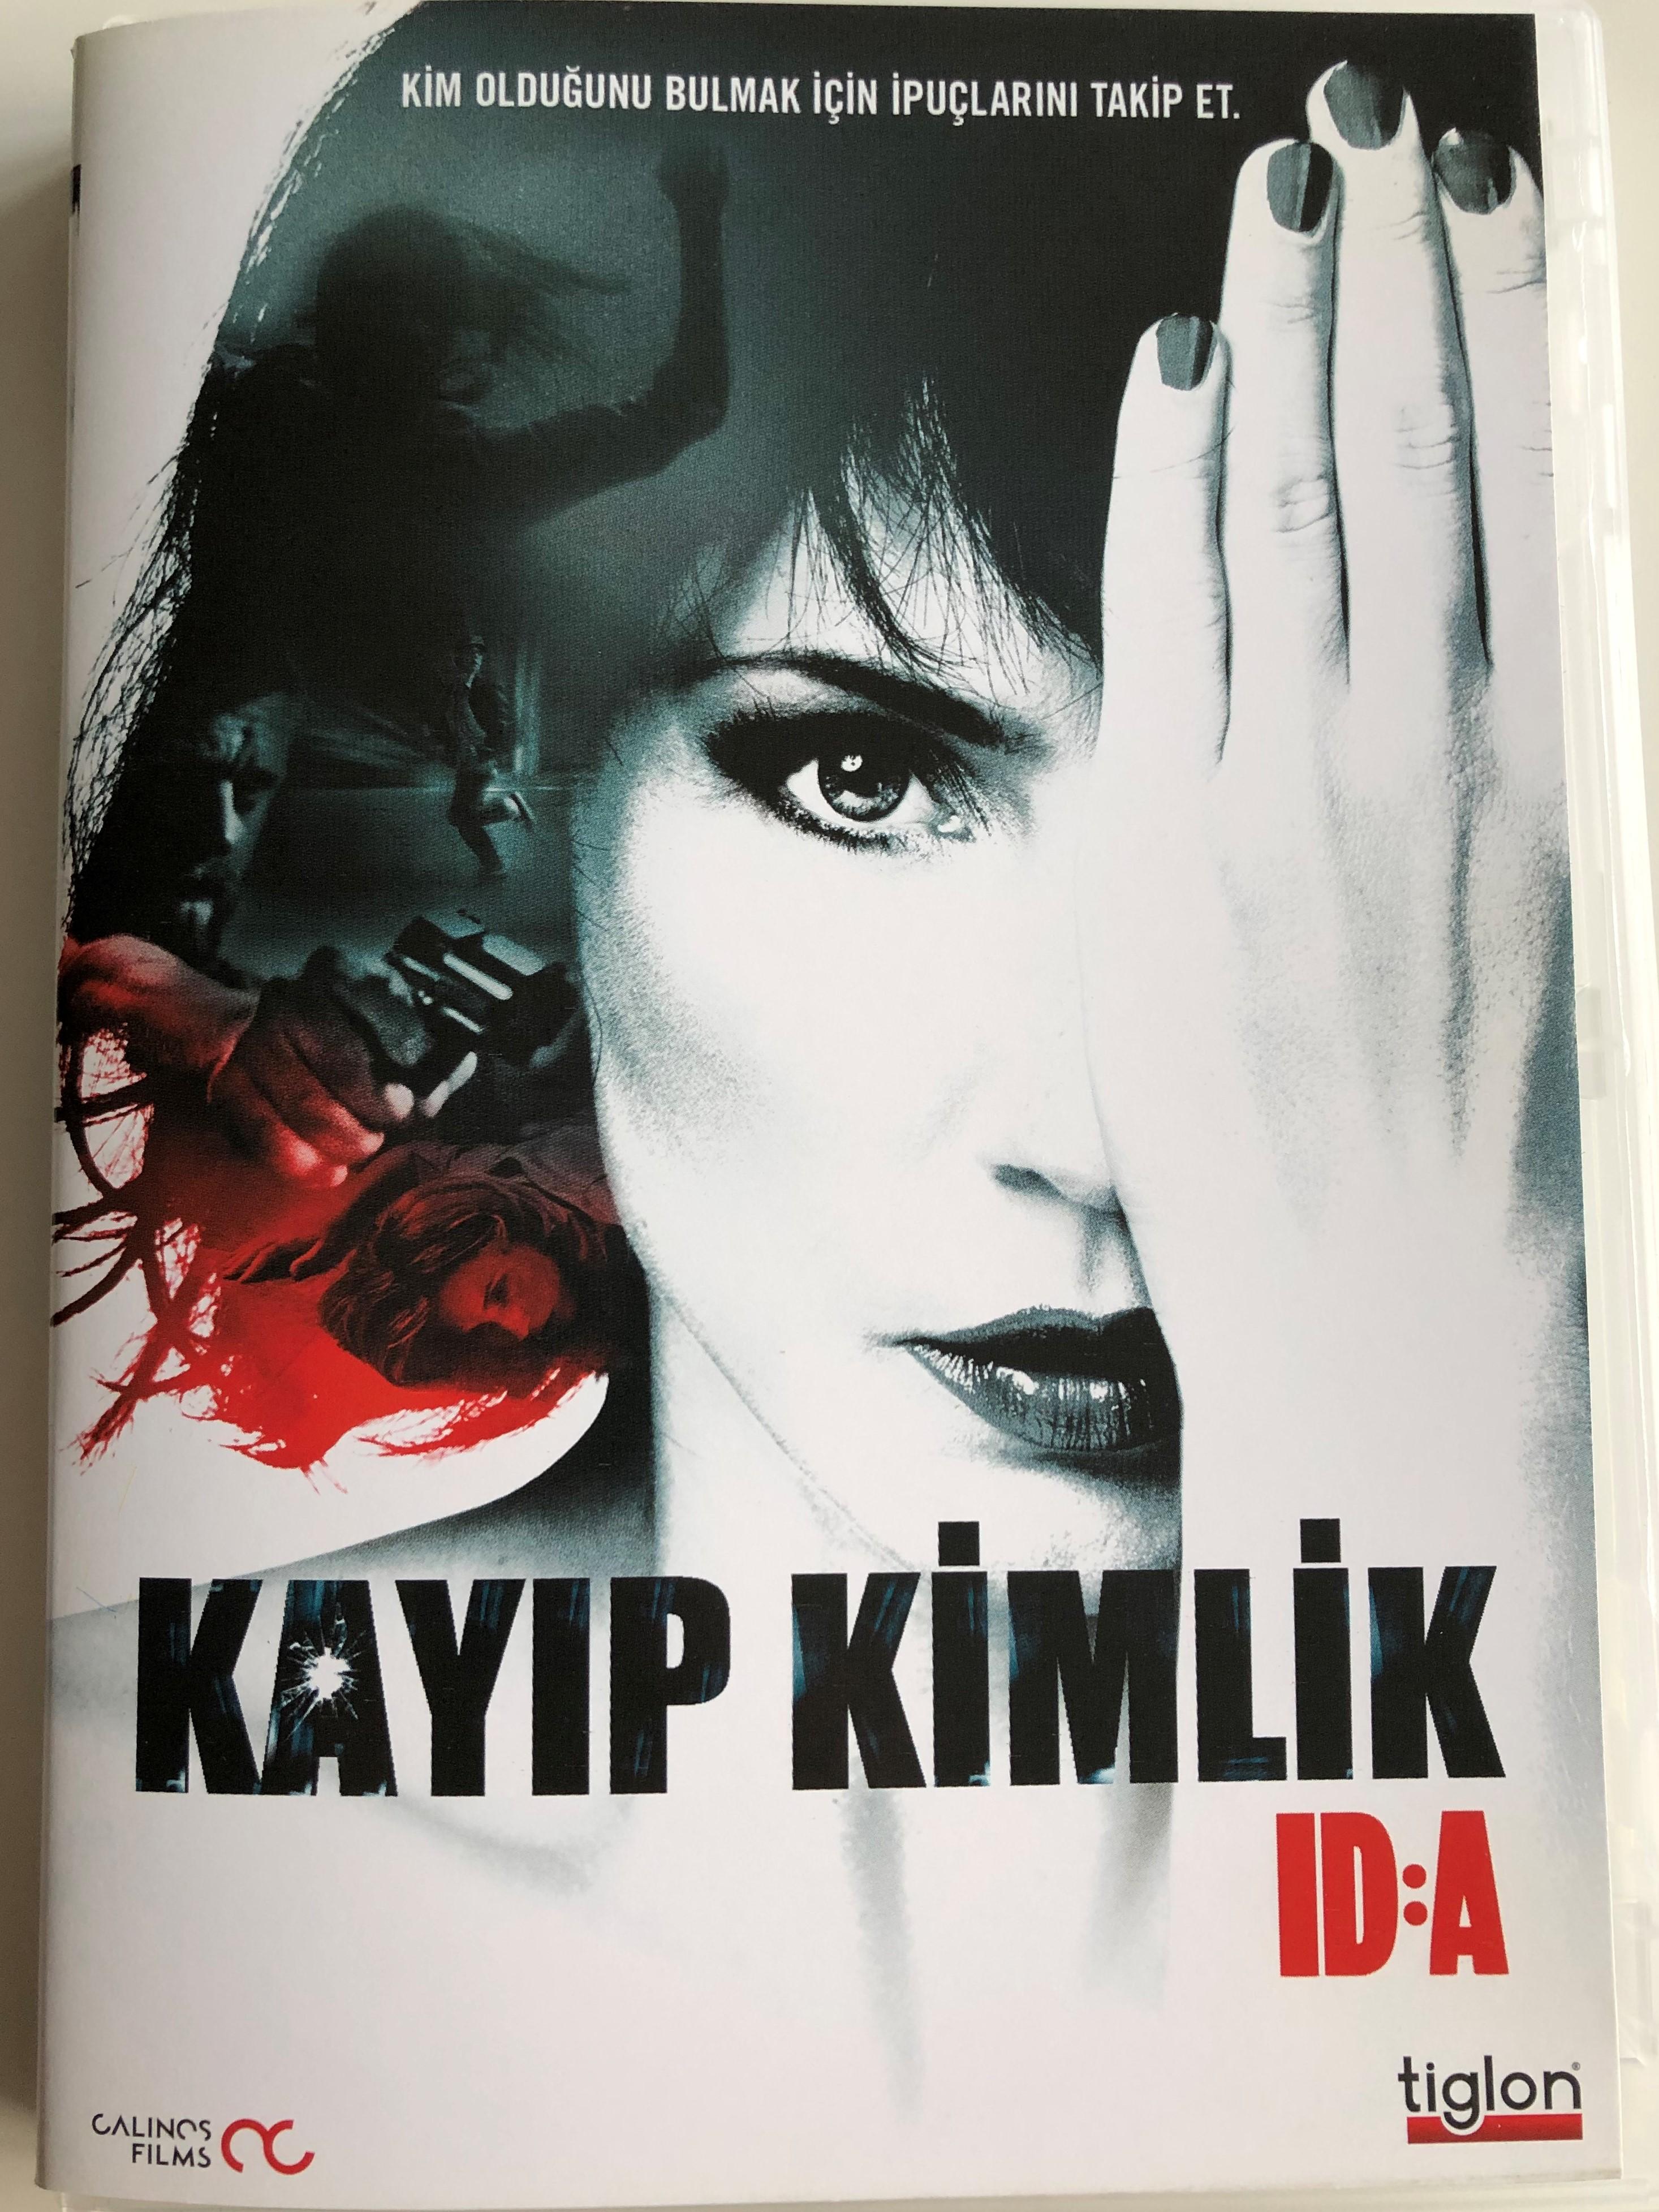 ida-dvd-2011-kayip-kimlik-directed-by-christian-e.-christiansen-1-.jpg